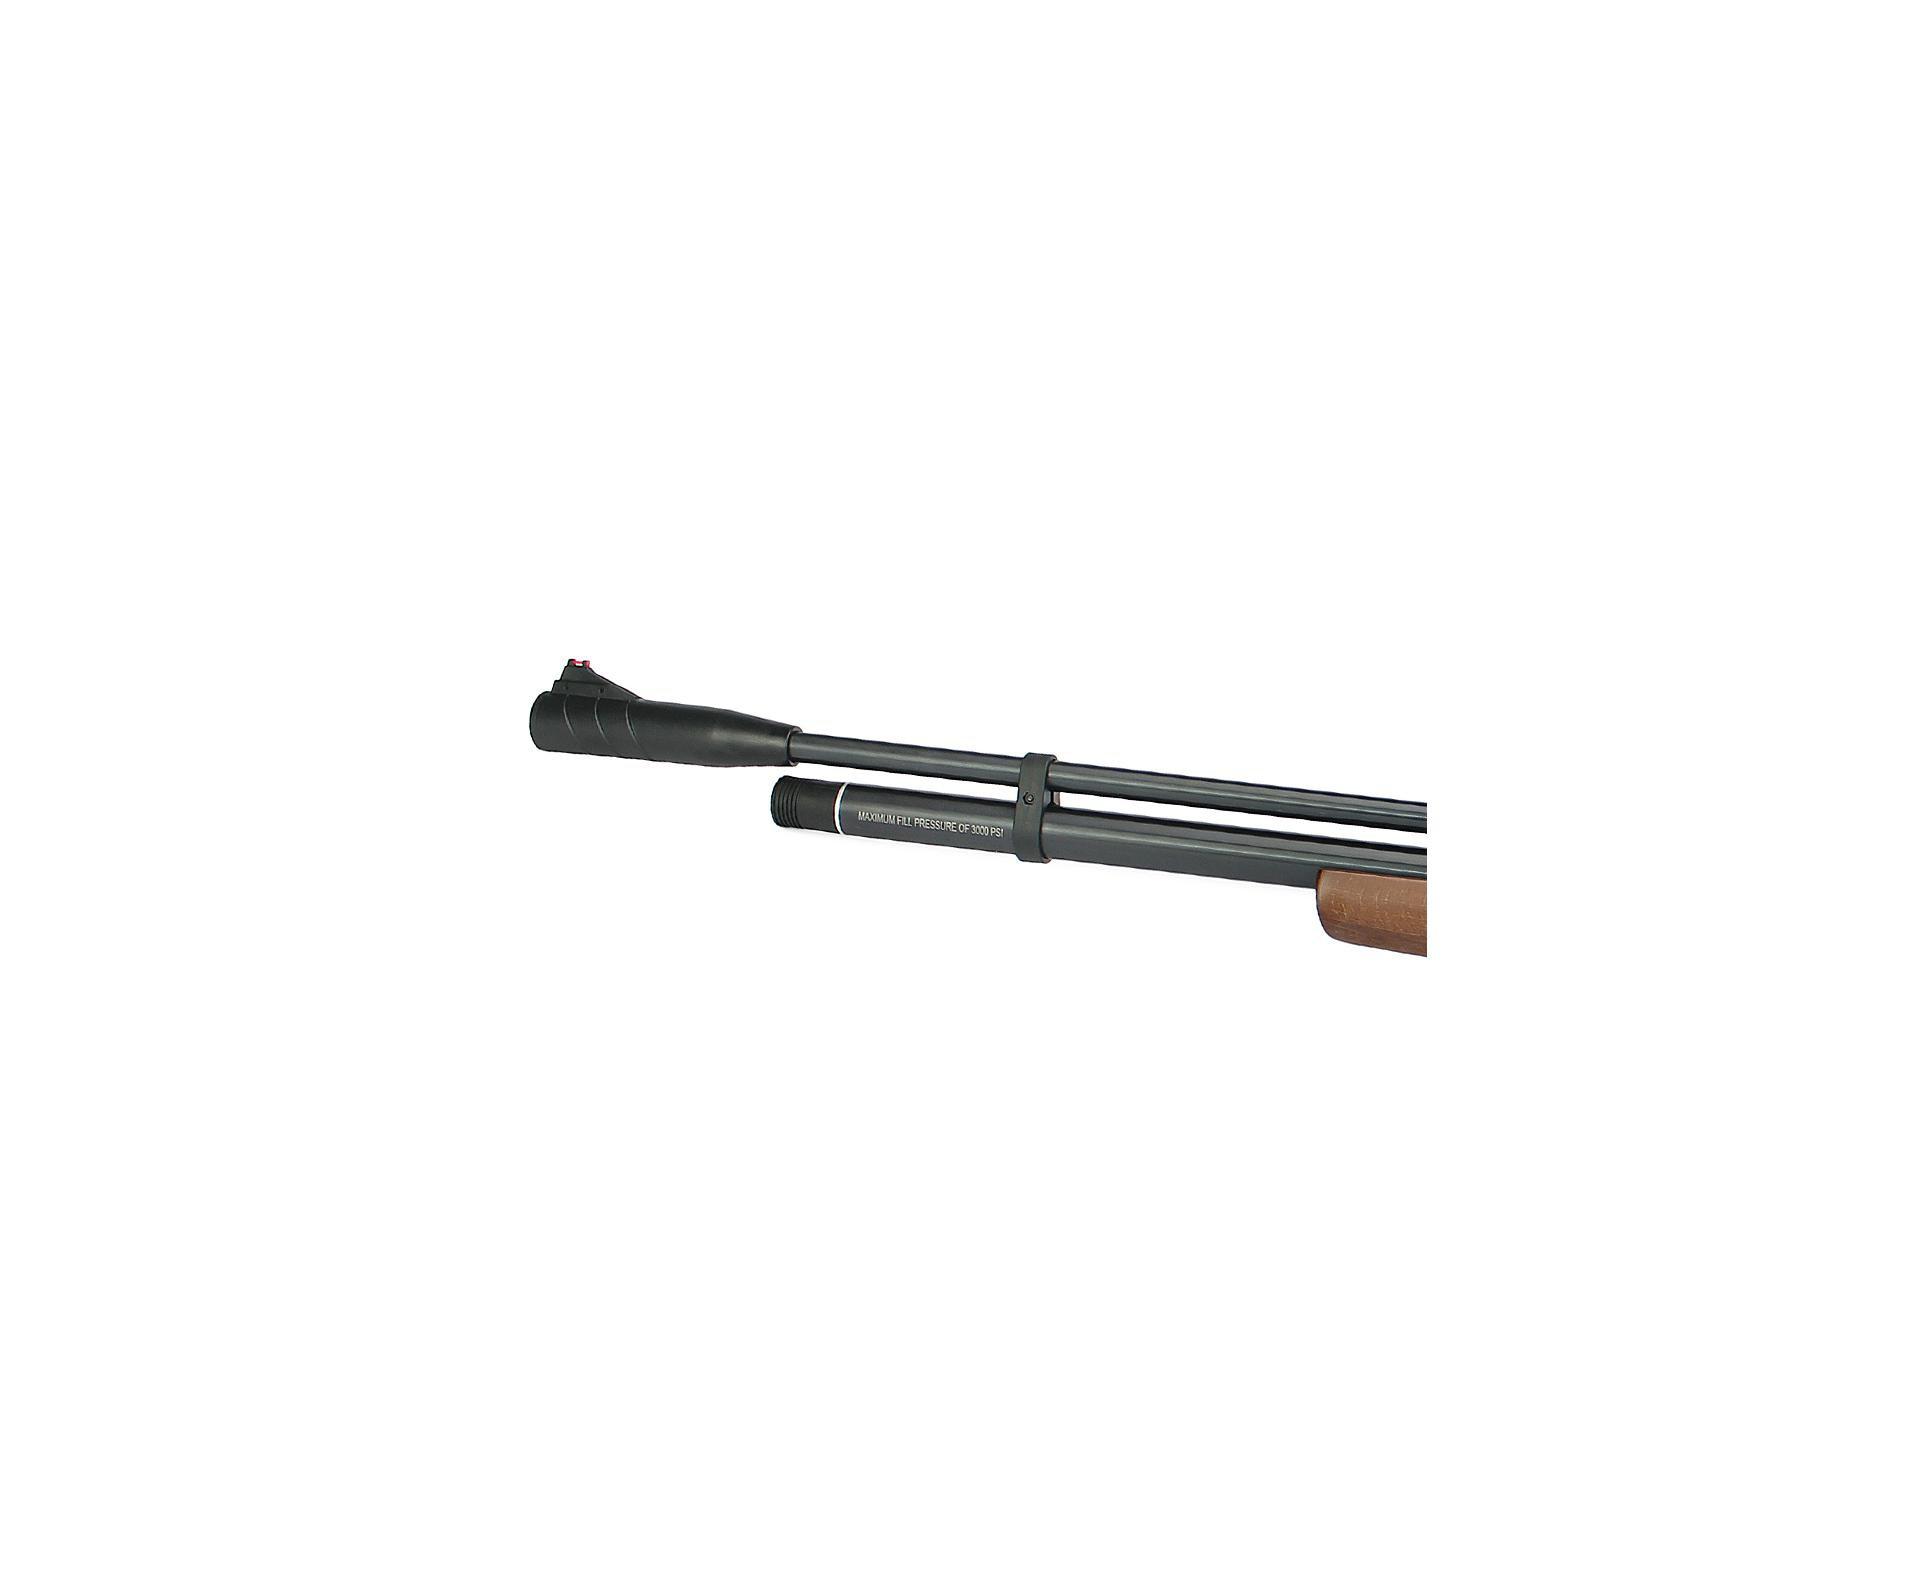 Carabina Pcp Beeman 1338 Qb Chief Madeira 10 Tiros 5,5mm - Rossi